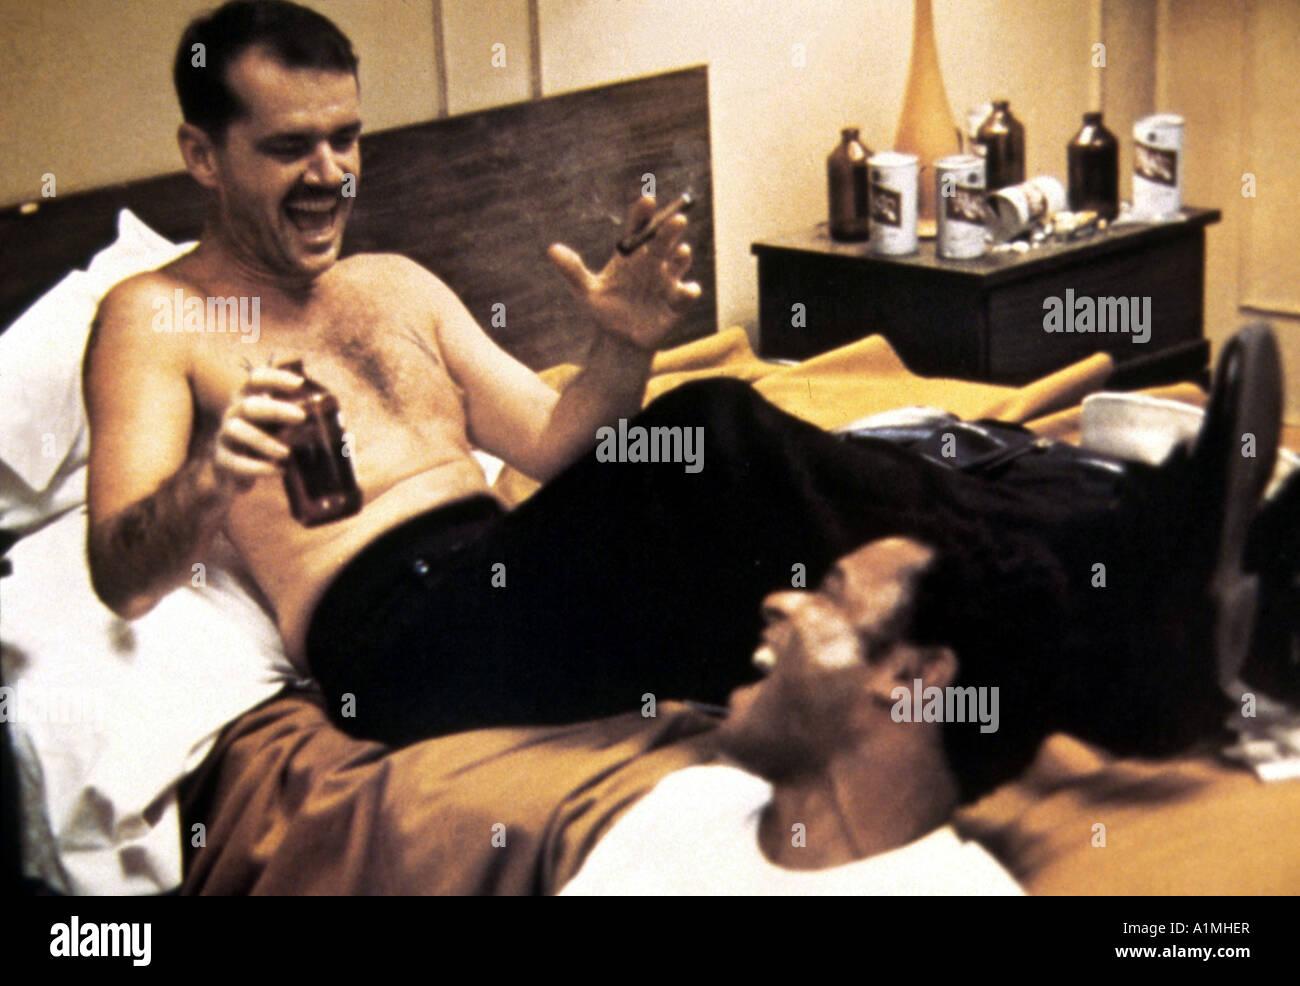 The Last Detail Year 1973 Director Hal Ashly Jack Nicholson Based upon Darryl Ponicsan s book - Stock Image